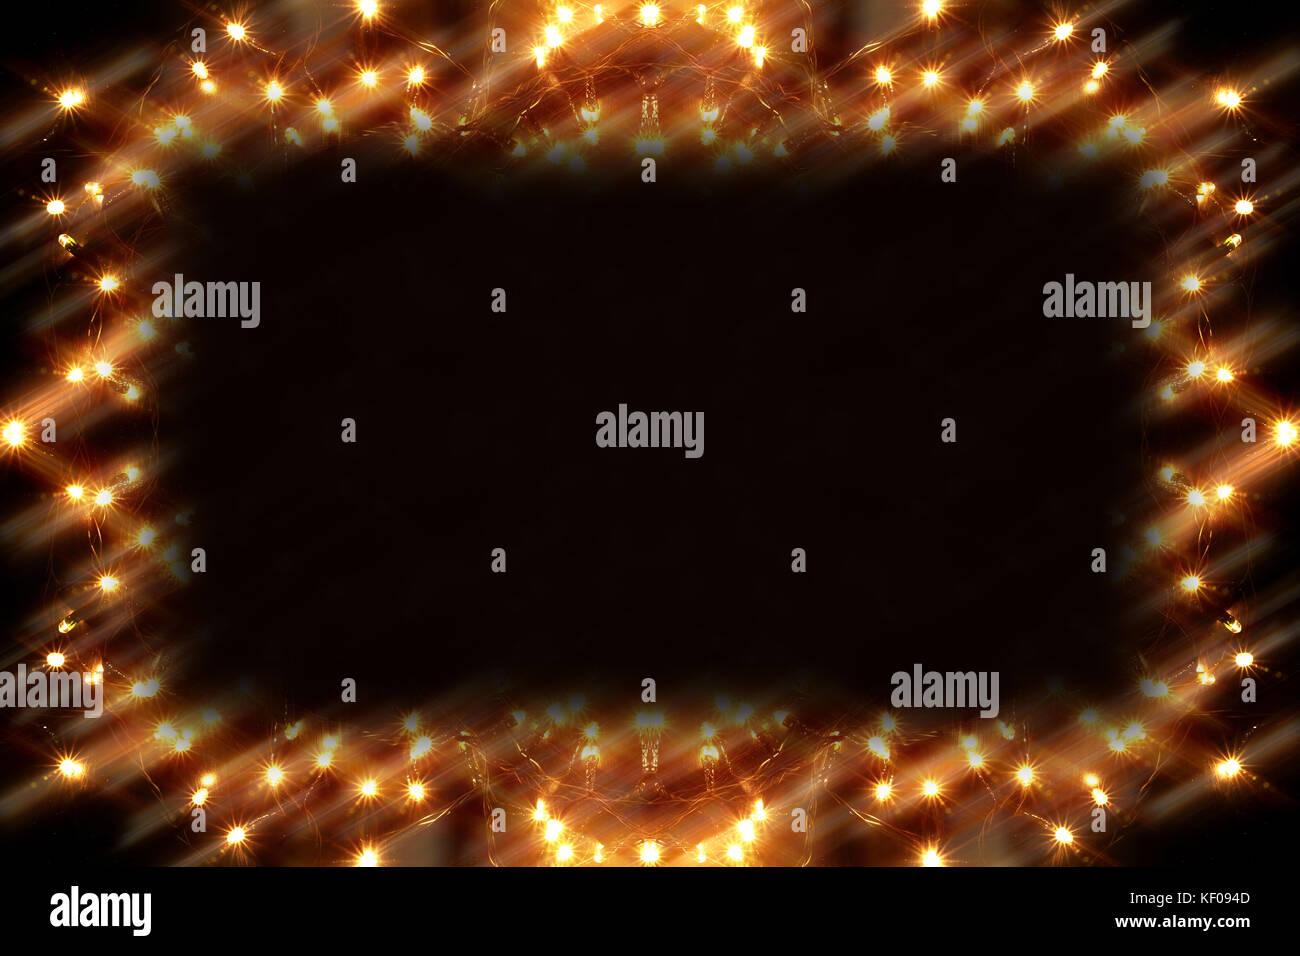 Christmas Lights on Black Background - Stock Image